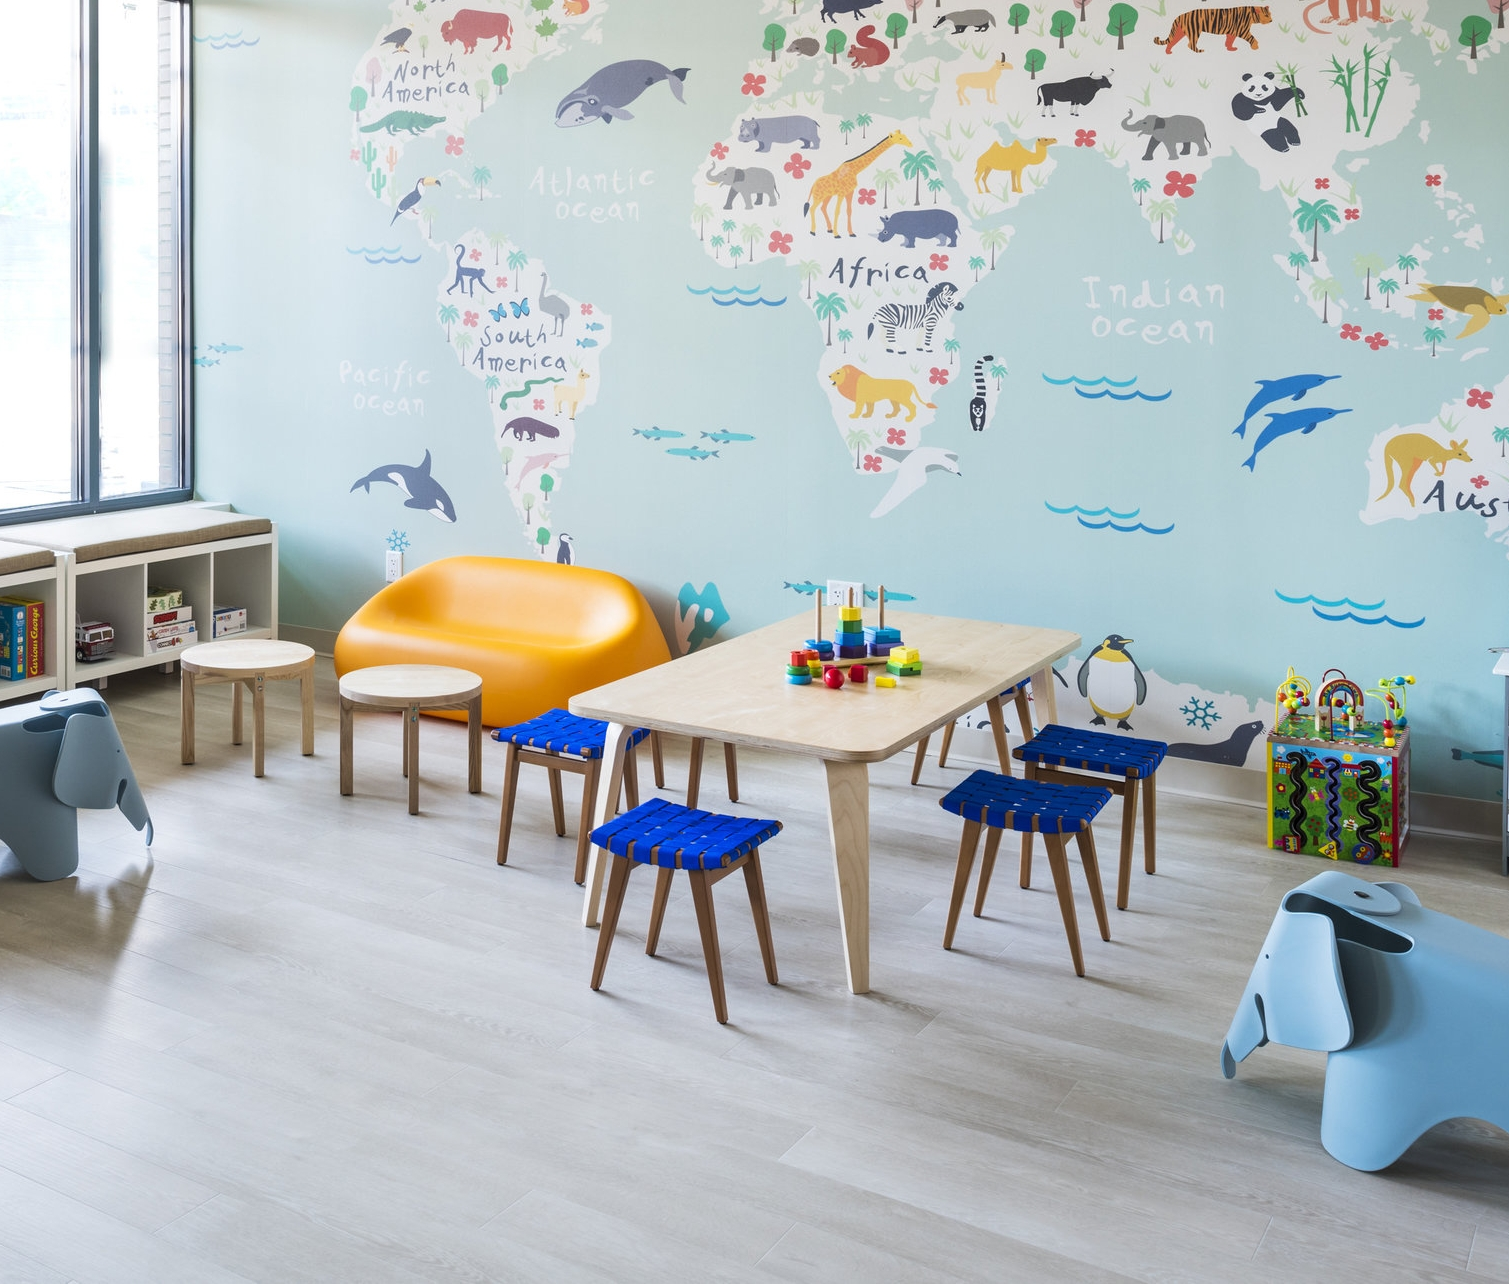 181-Front-Street-Playroom.jpg